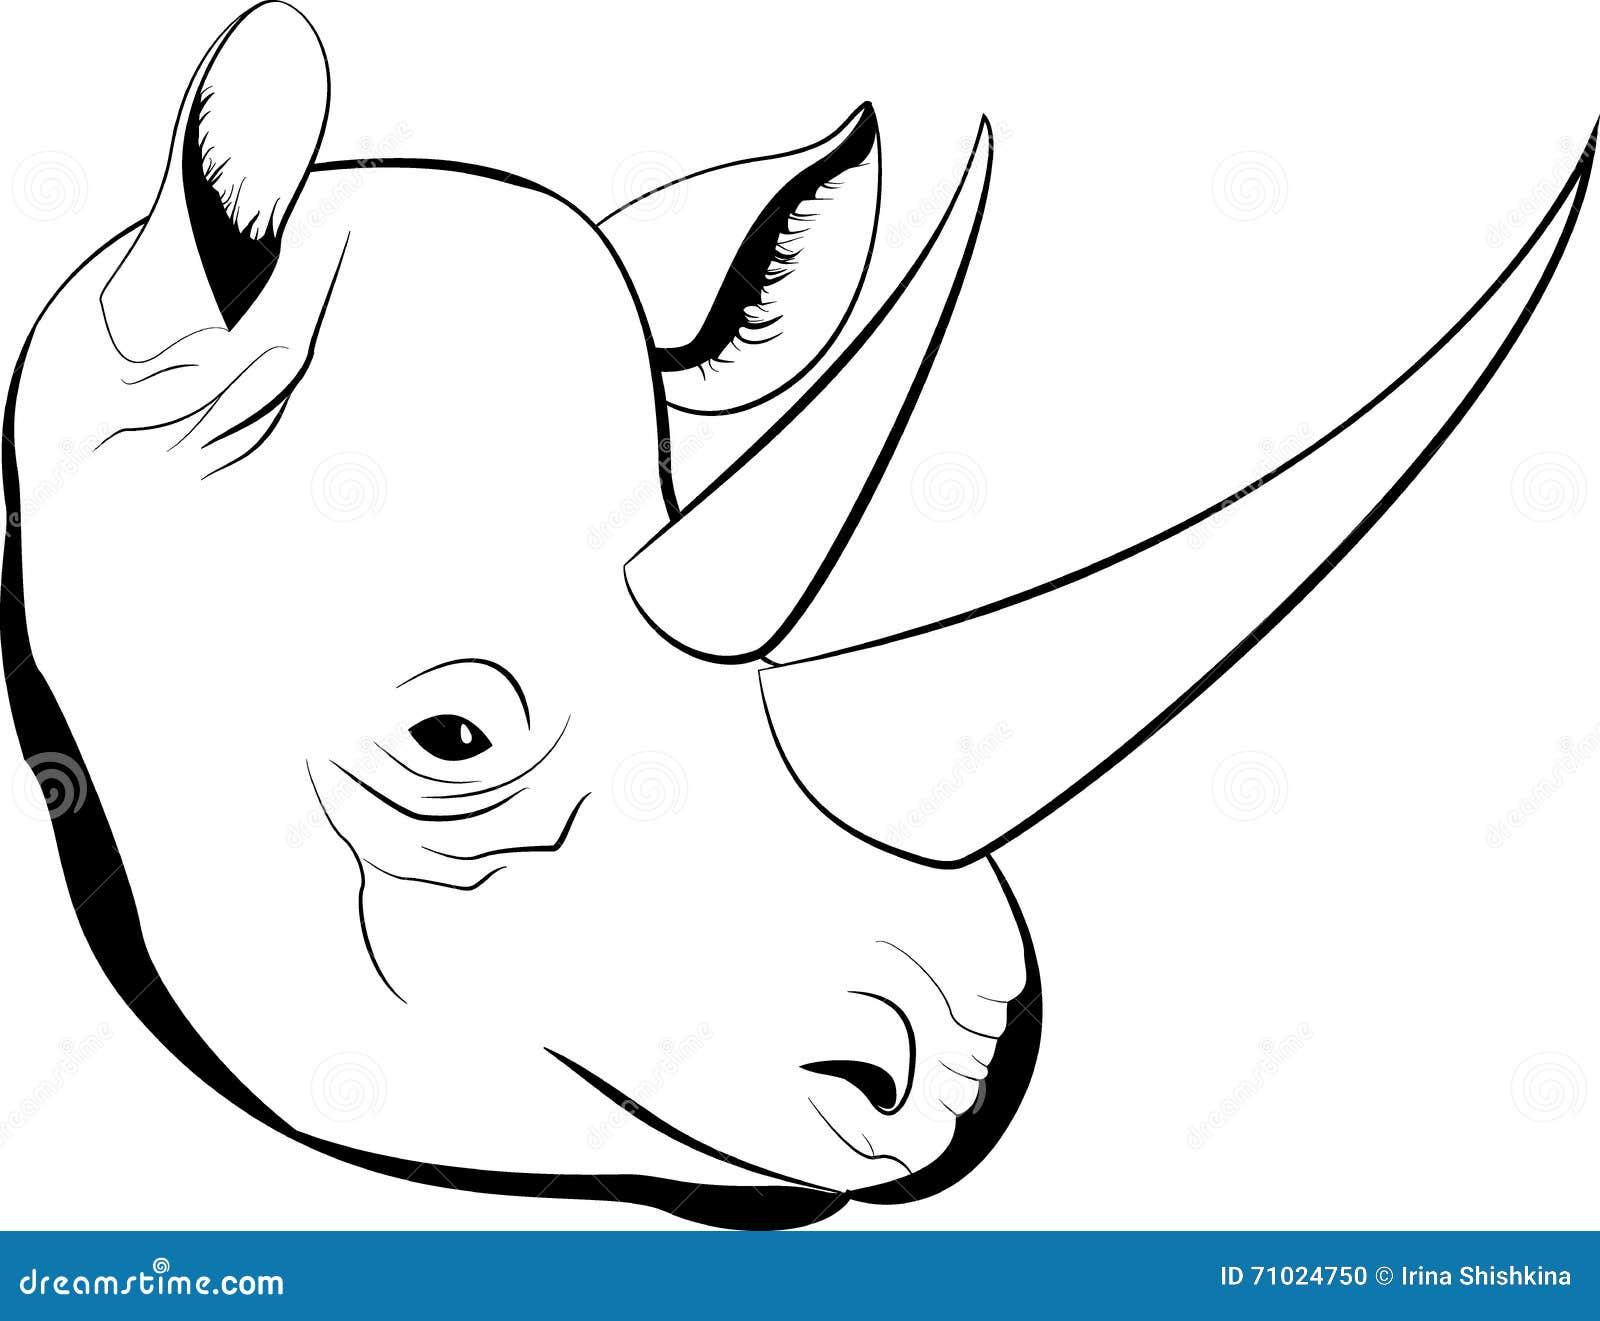 Image Gallery simple rhino